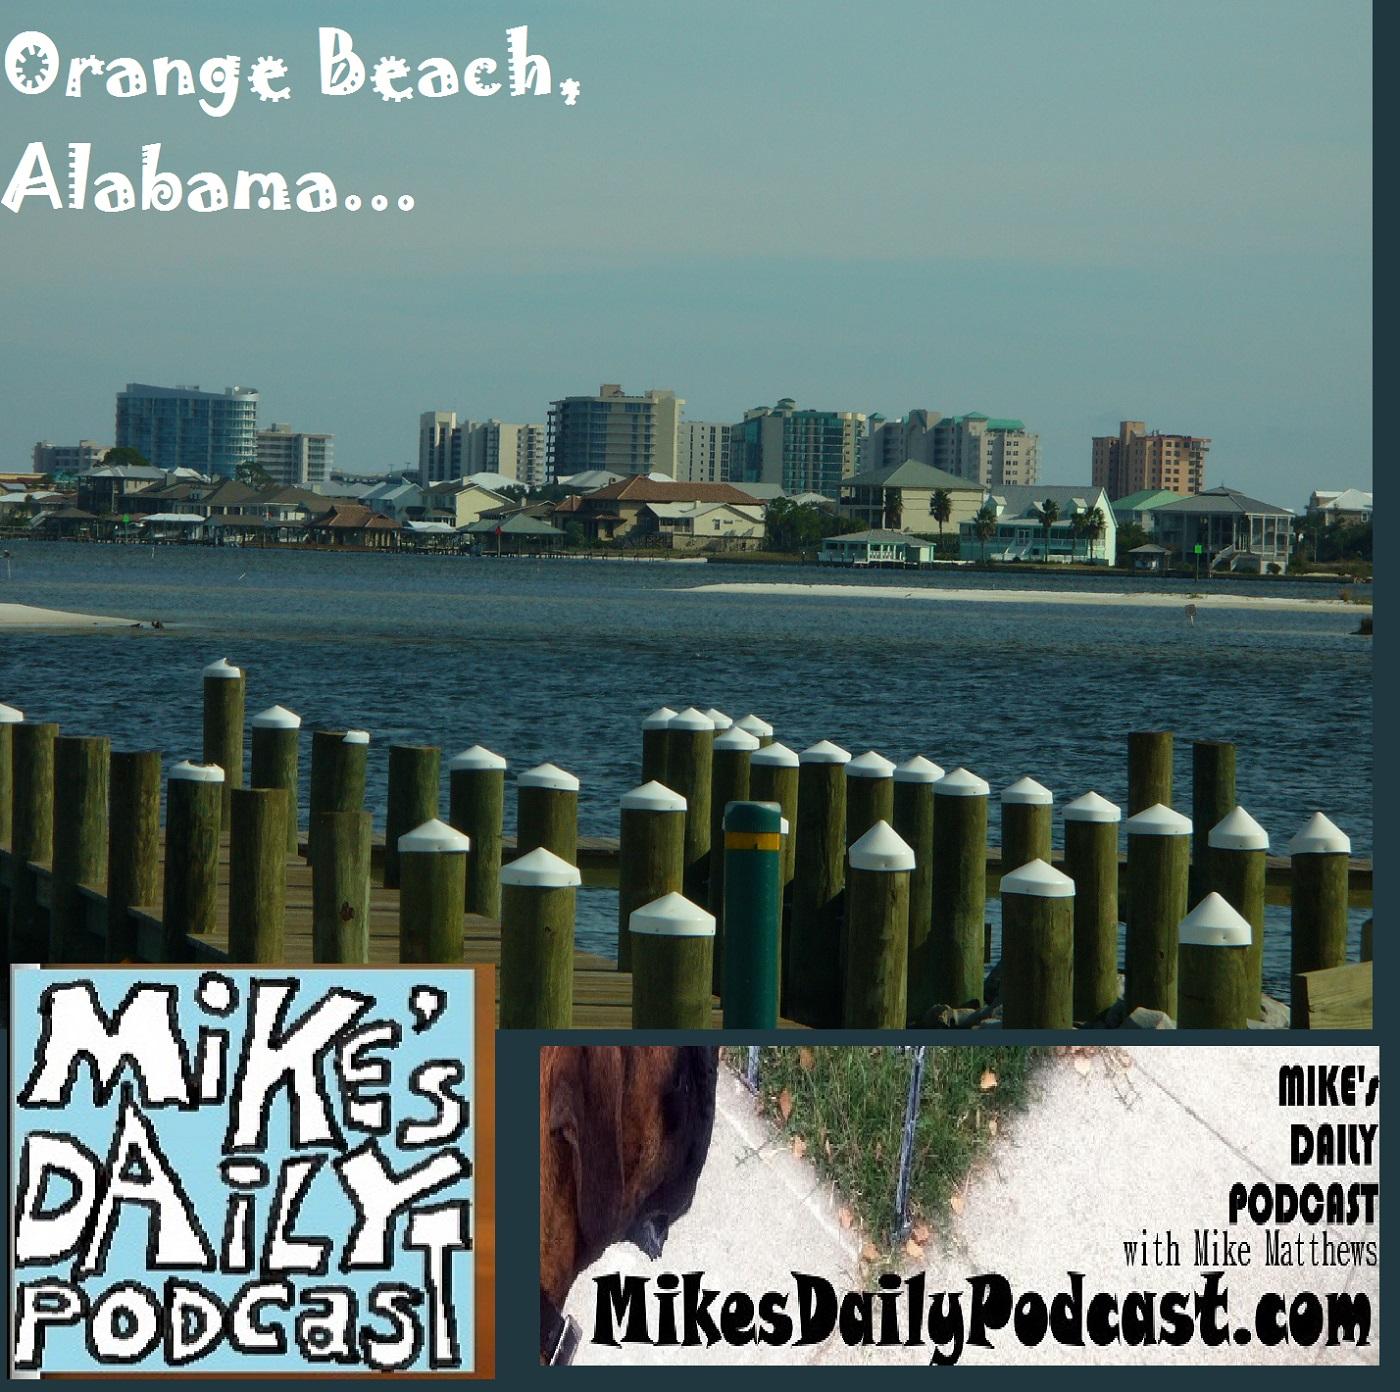 mikes-daily-podcast-1209-orange-beach-alabama